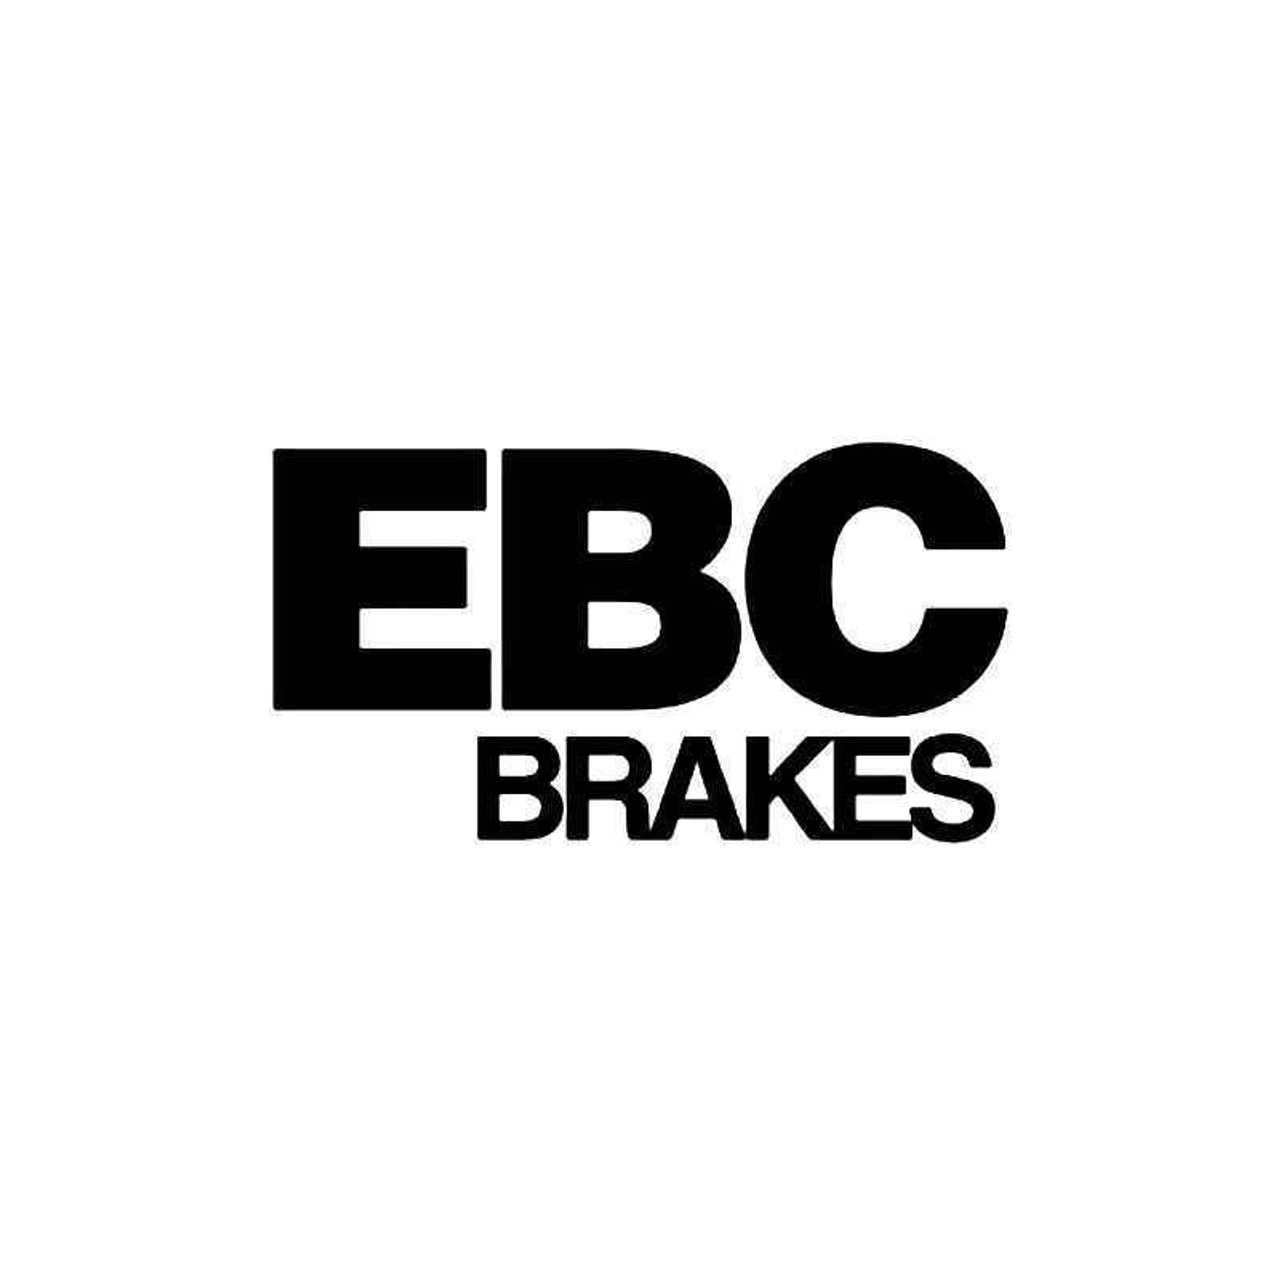 Ebc Brakes 1 Vinyl Sticker